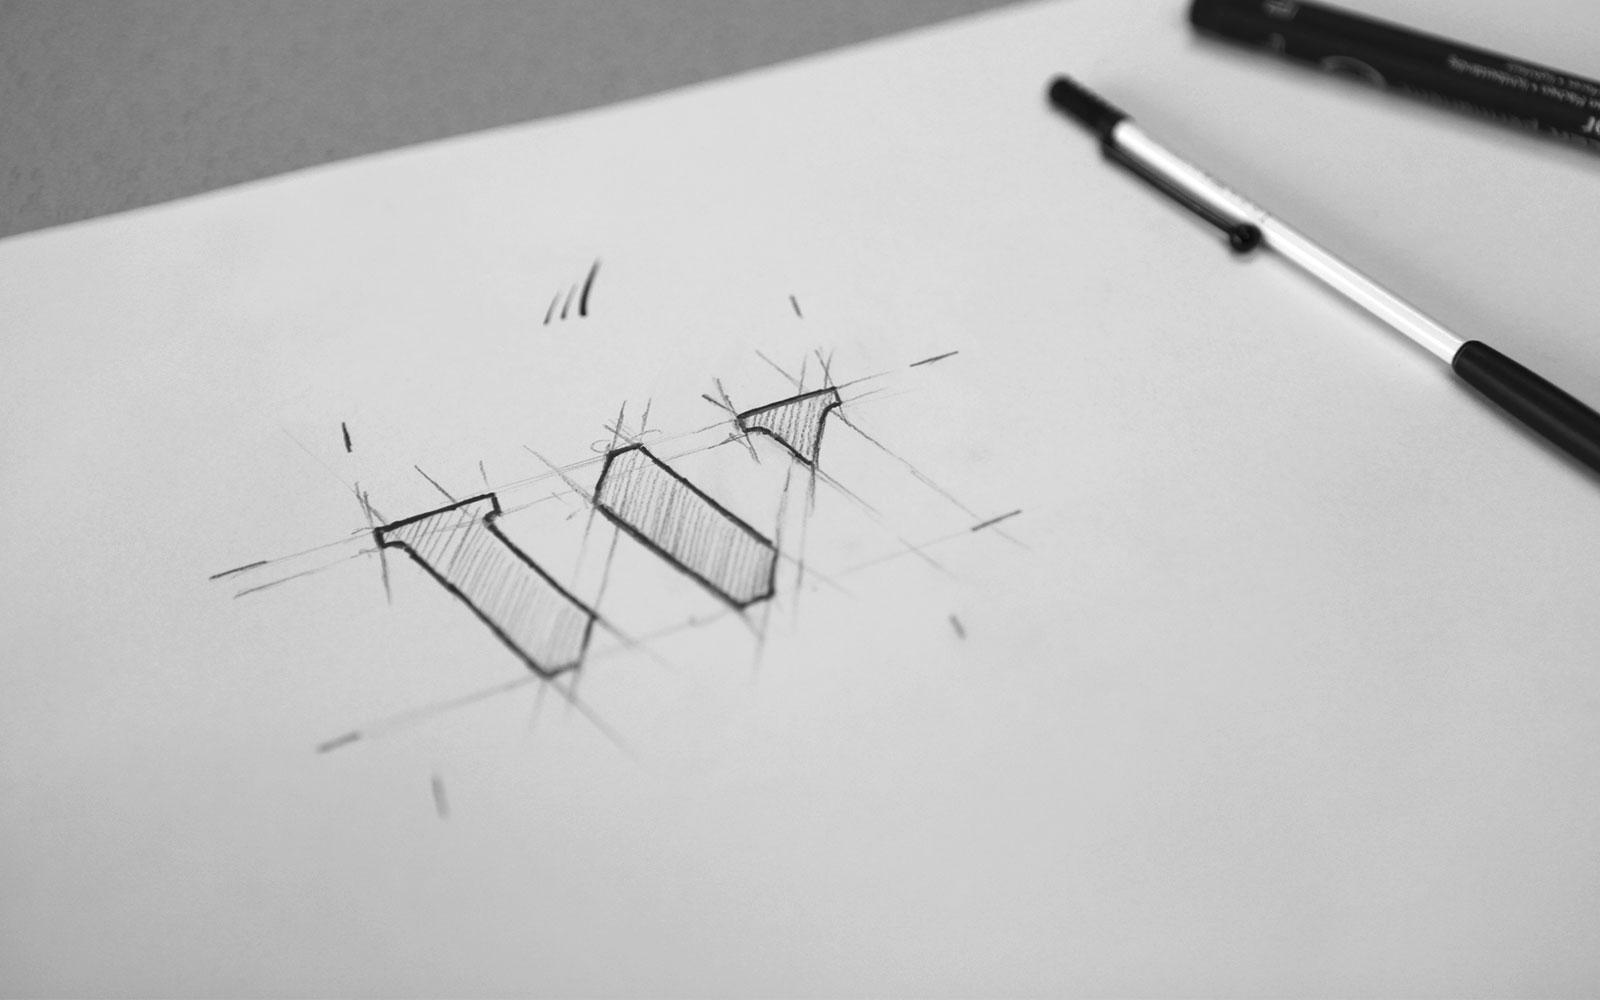 wagner_scribble_1600p